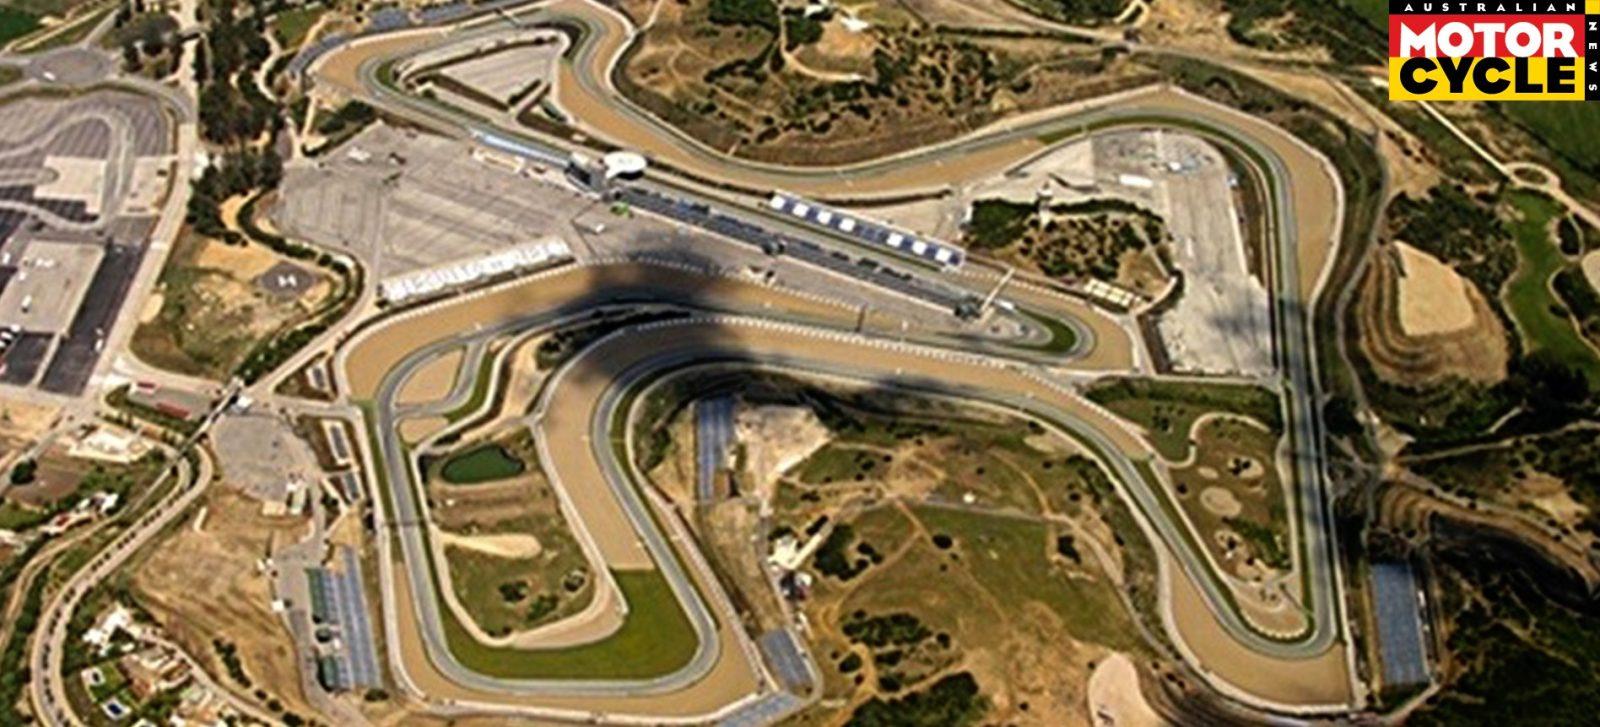 Track facts: MotoGP round 4 Jerez, Spain - Australian Motorcycle News